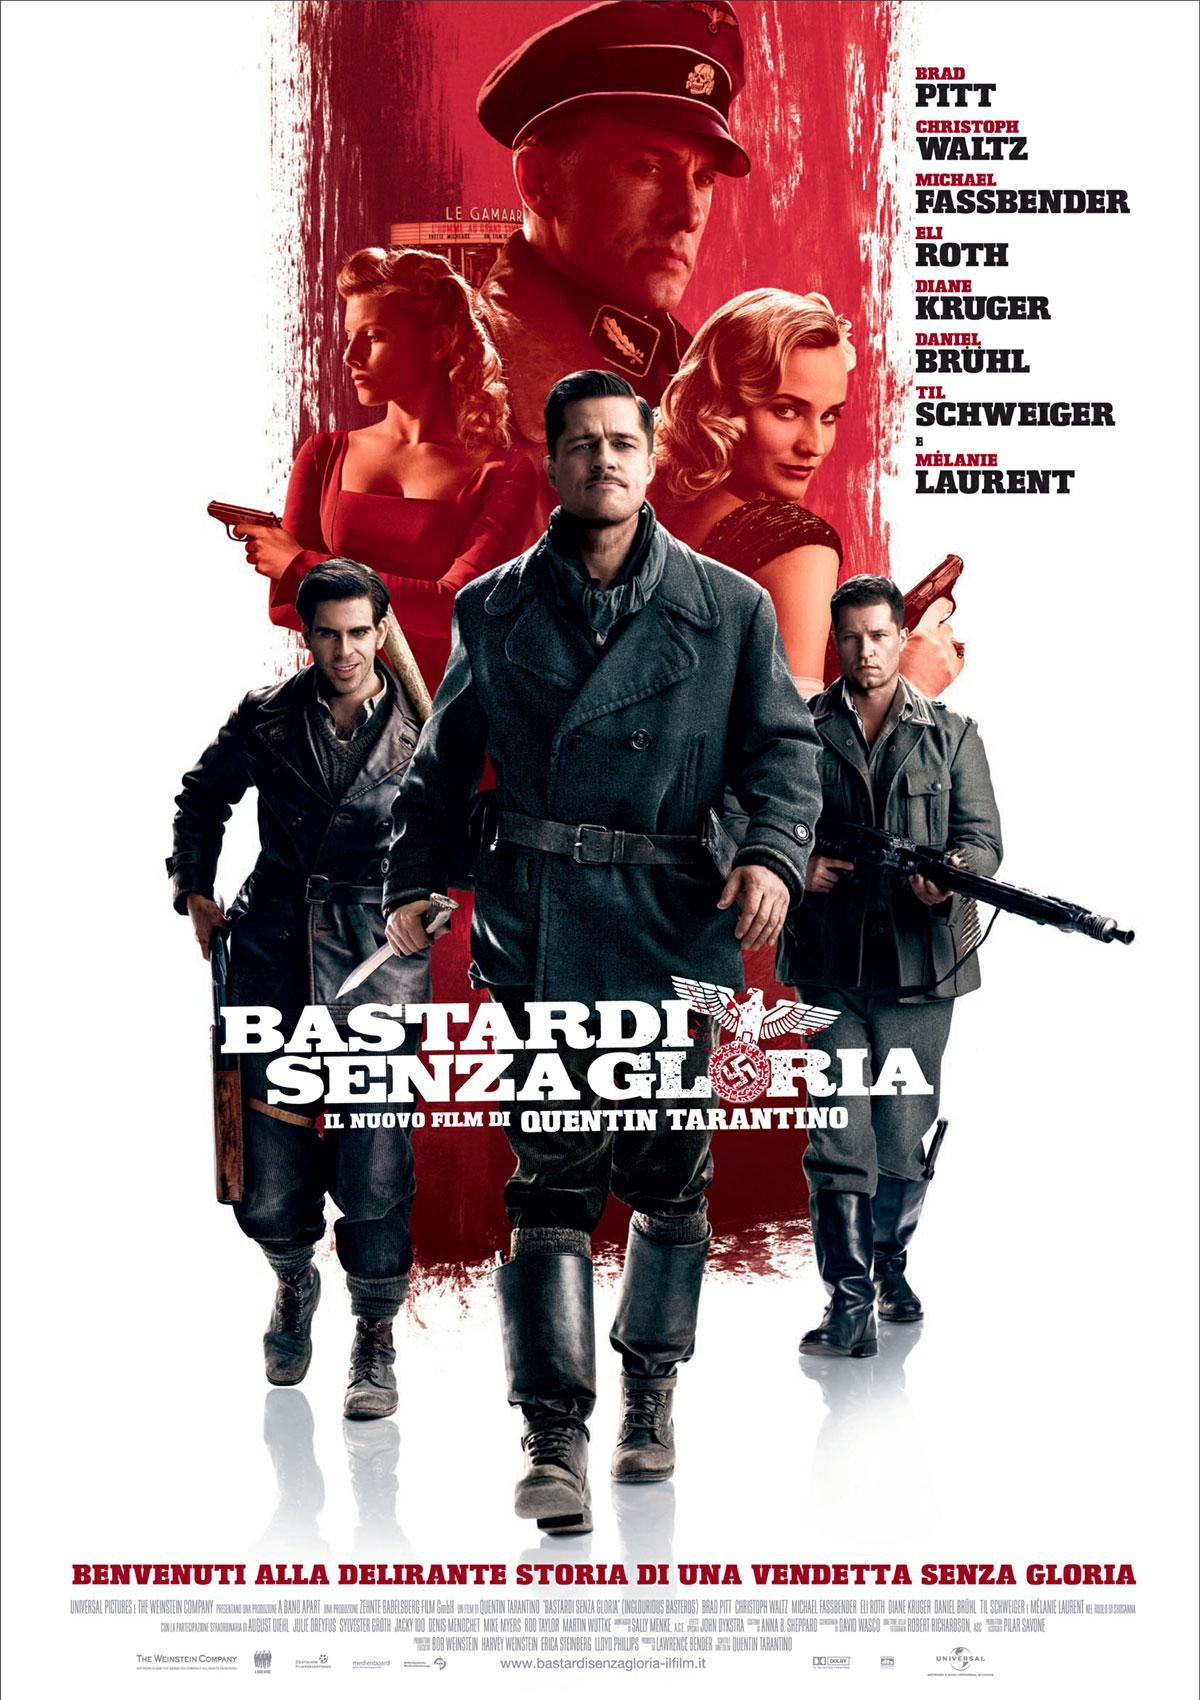 Bastardi senza gloria, locandina del film